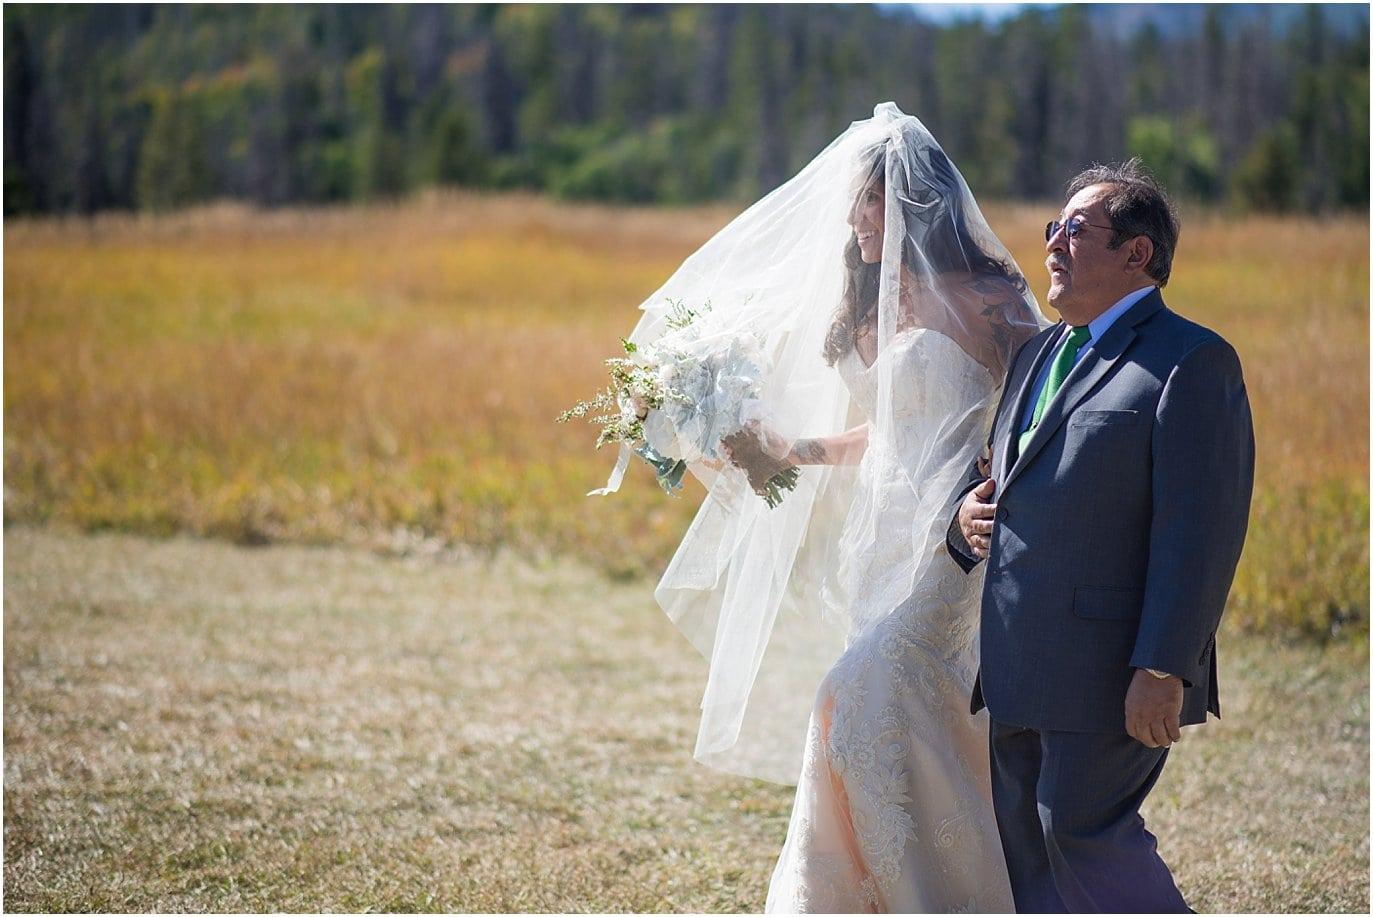 Midnight Ranch intimate wedding ceremony photo